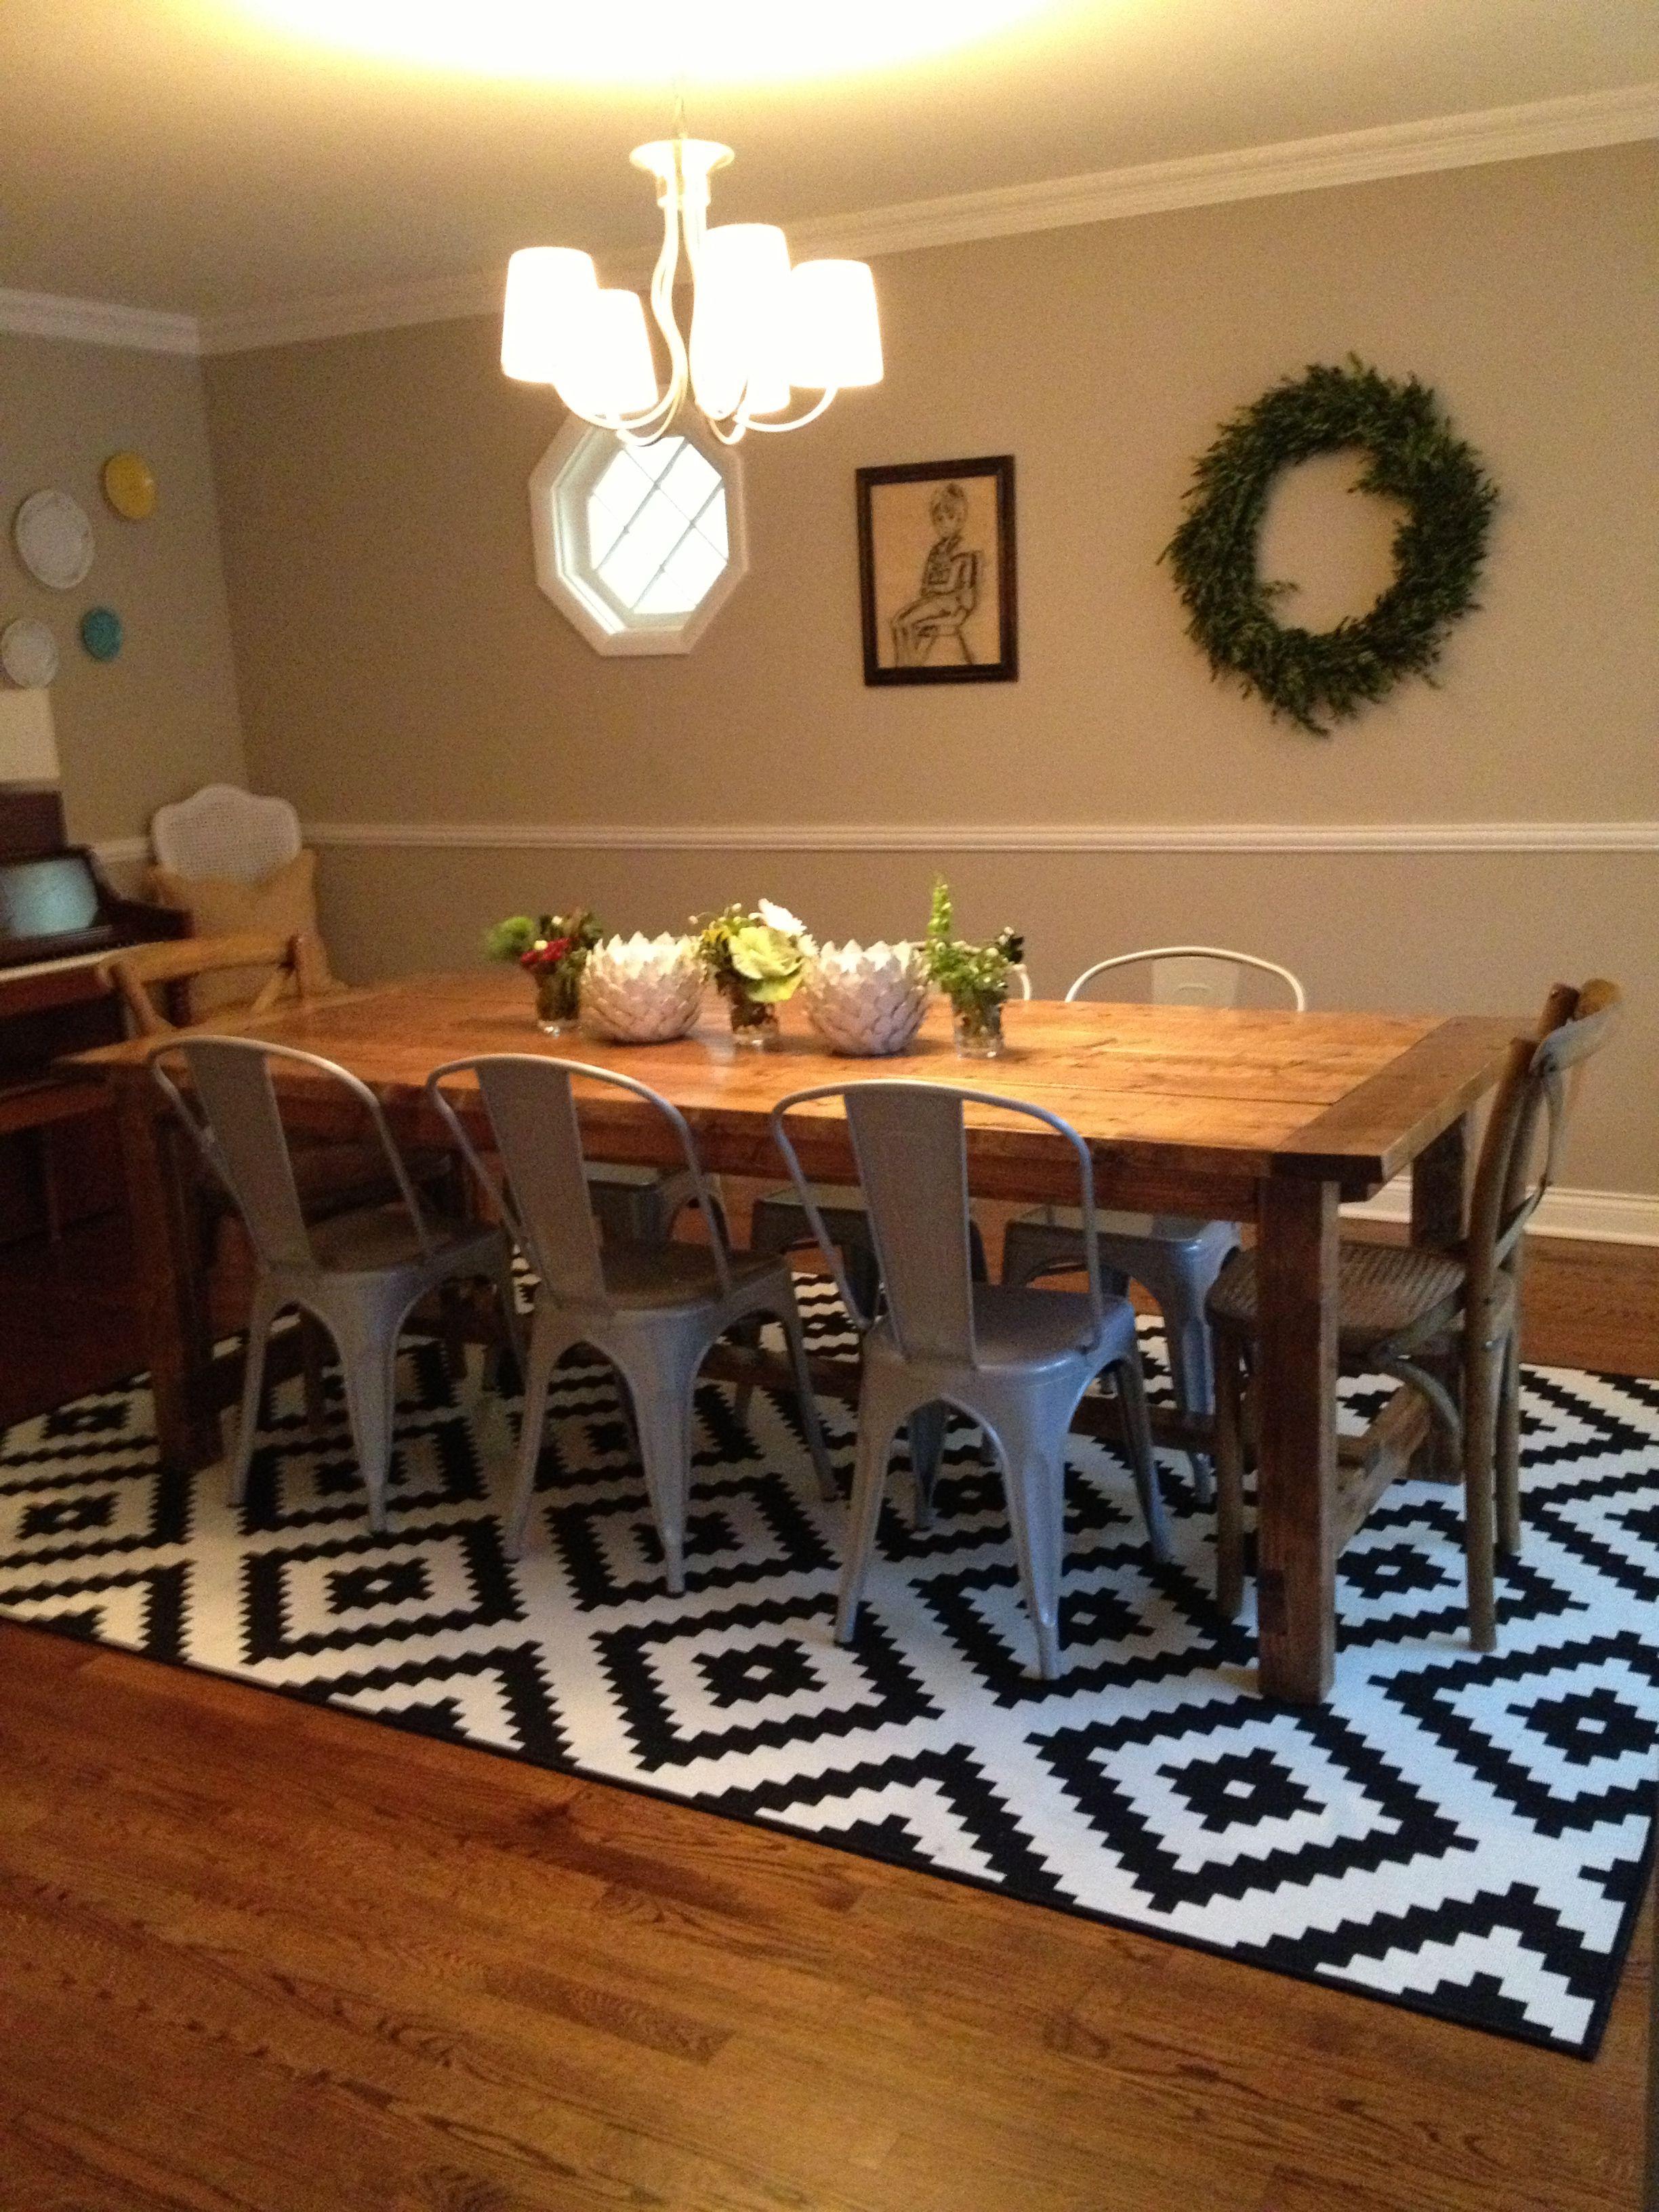 farmhouse dining table. diy anawhite Farmhouse dining